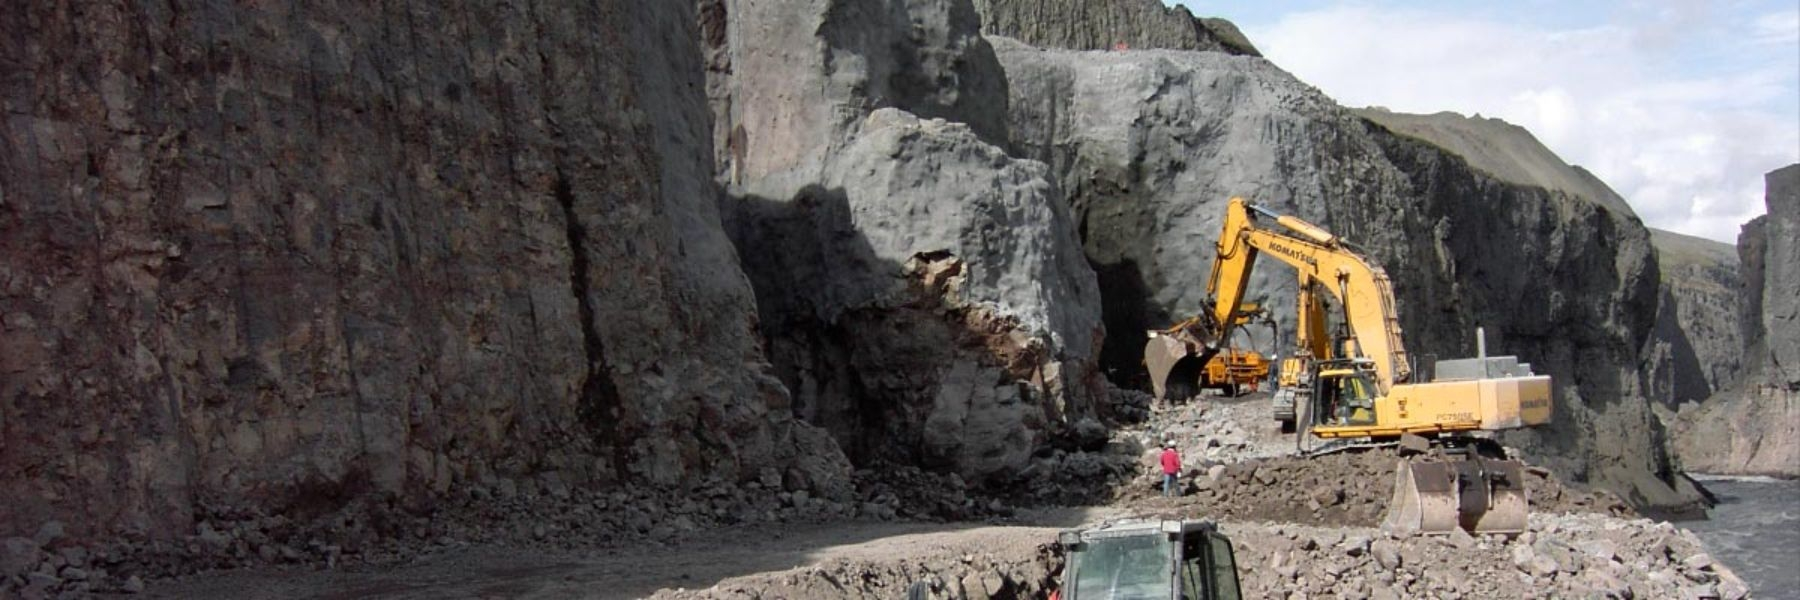 MINERAÇÃO | minerario slide 03(1)